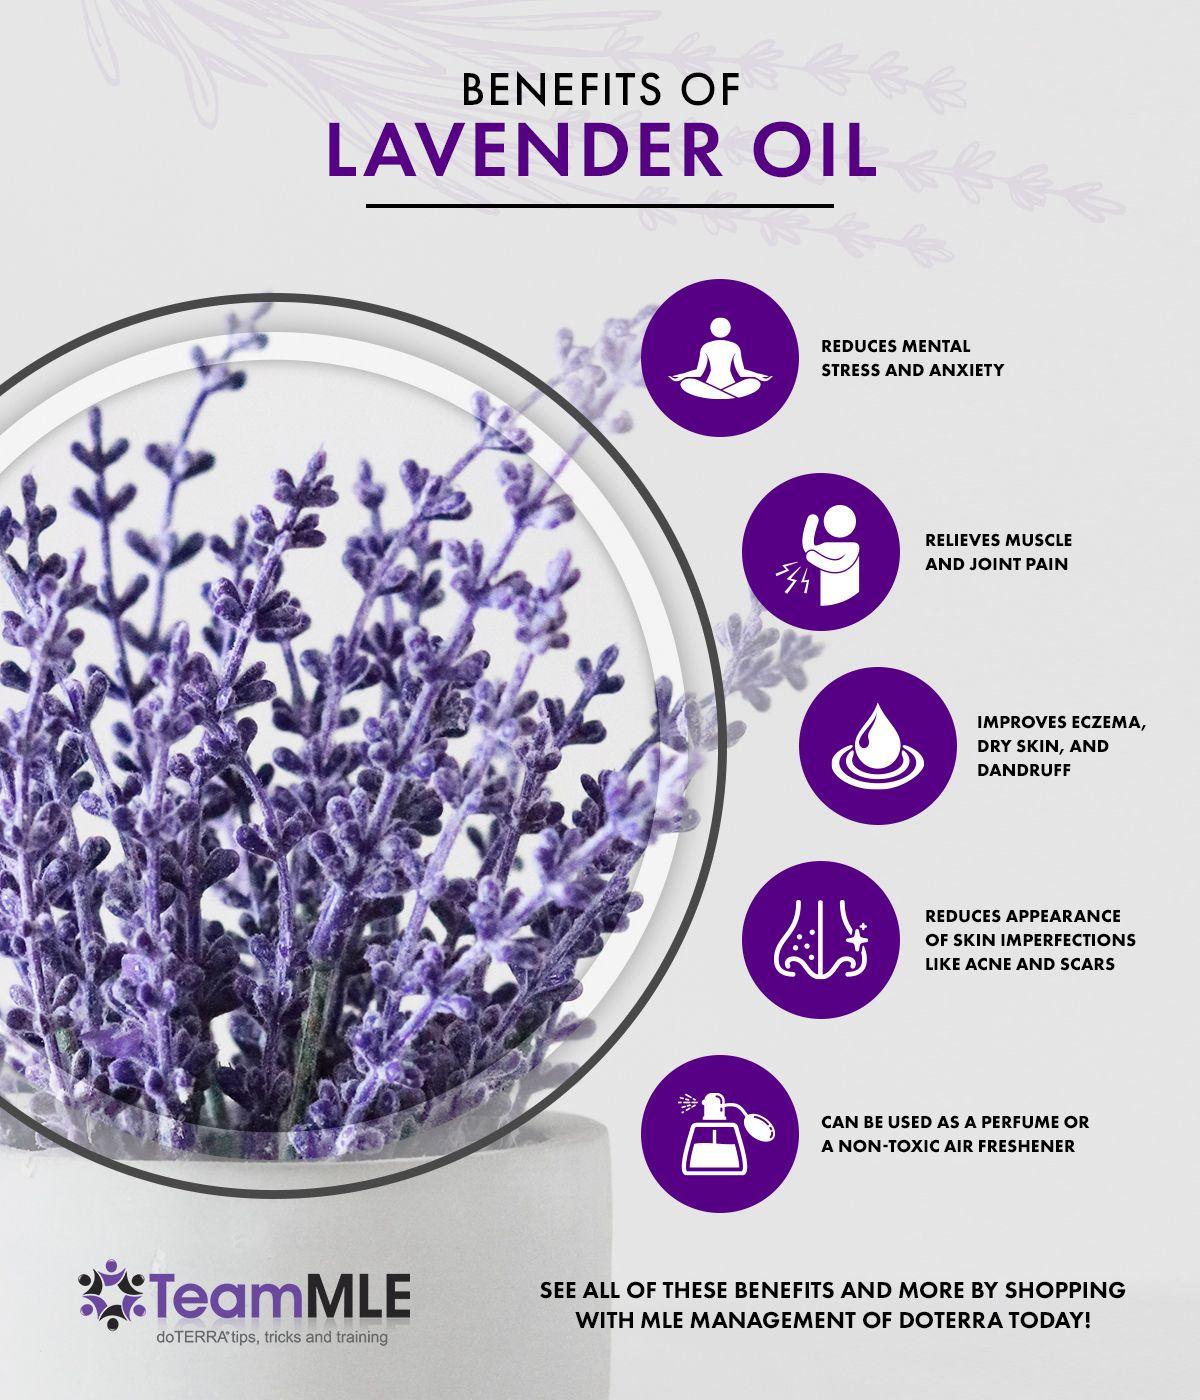 Benefits of Lavender Oil.jpg